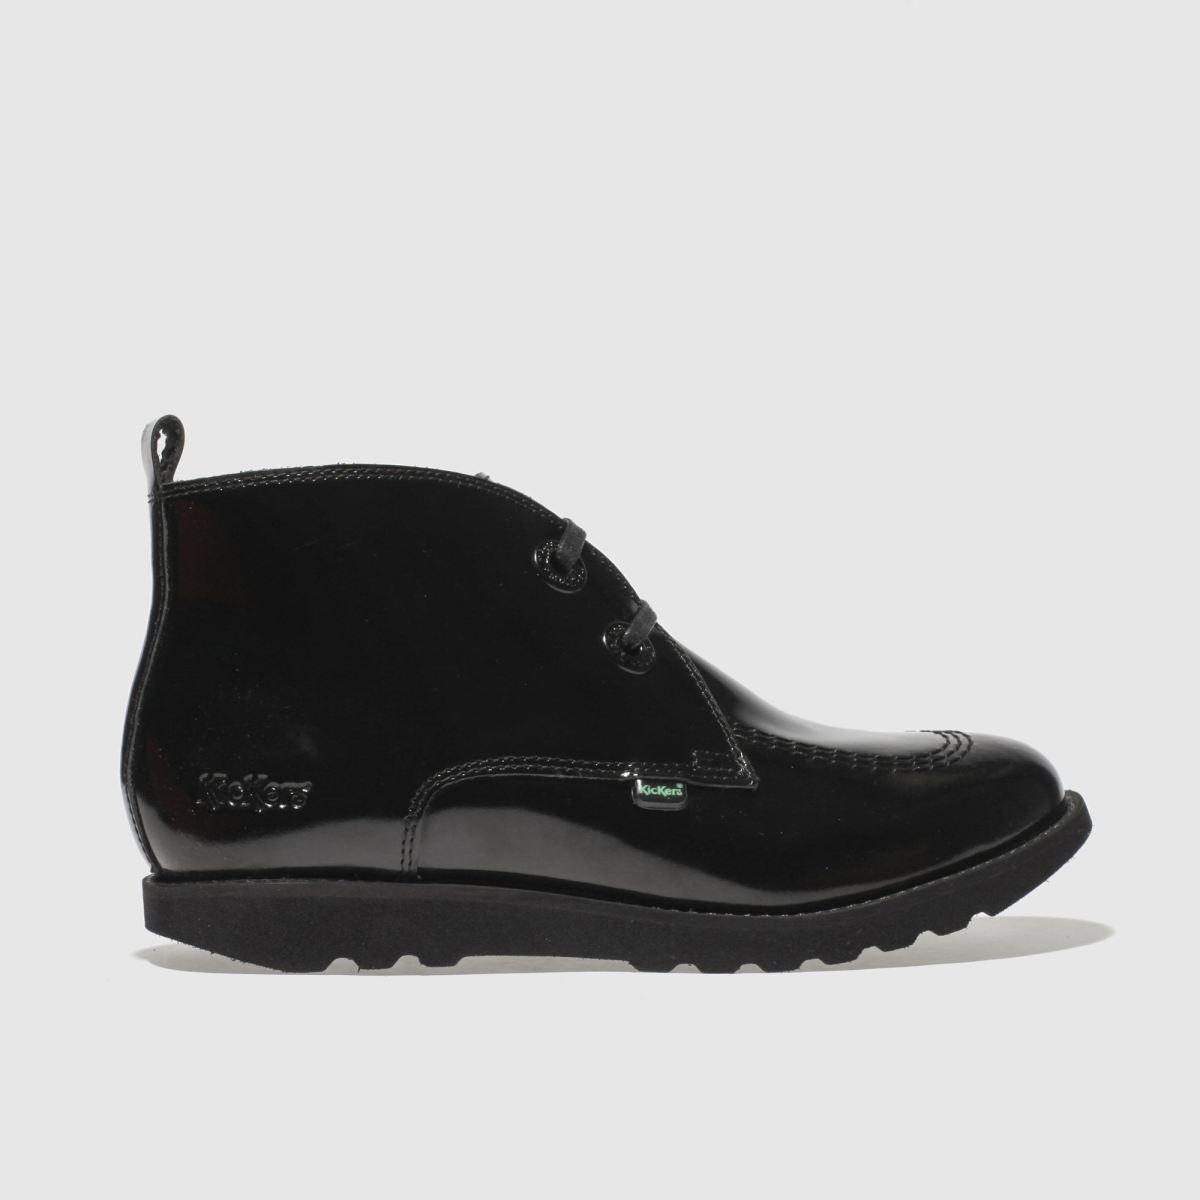 Kickers Black C Lite Desert Girls Youth Boots